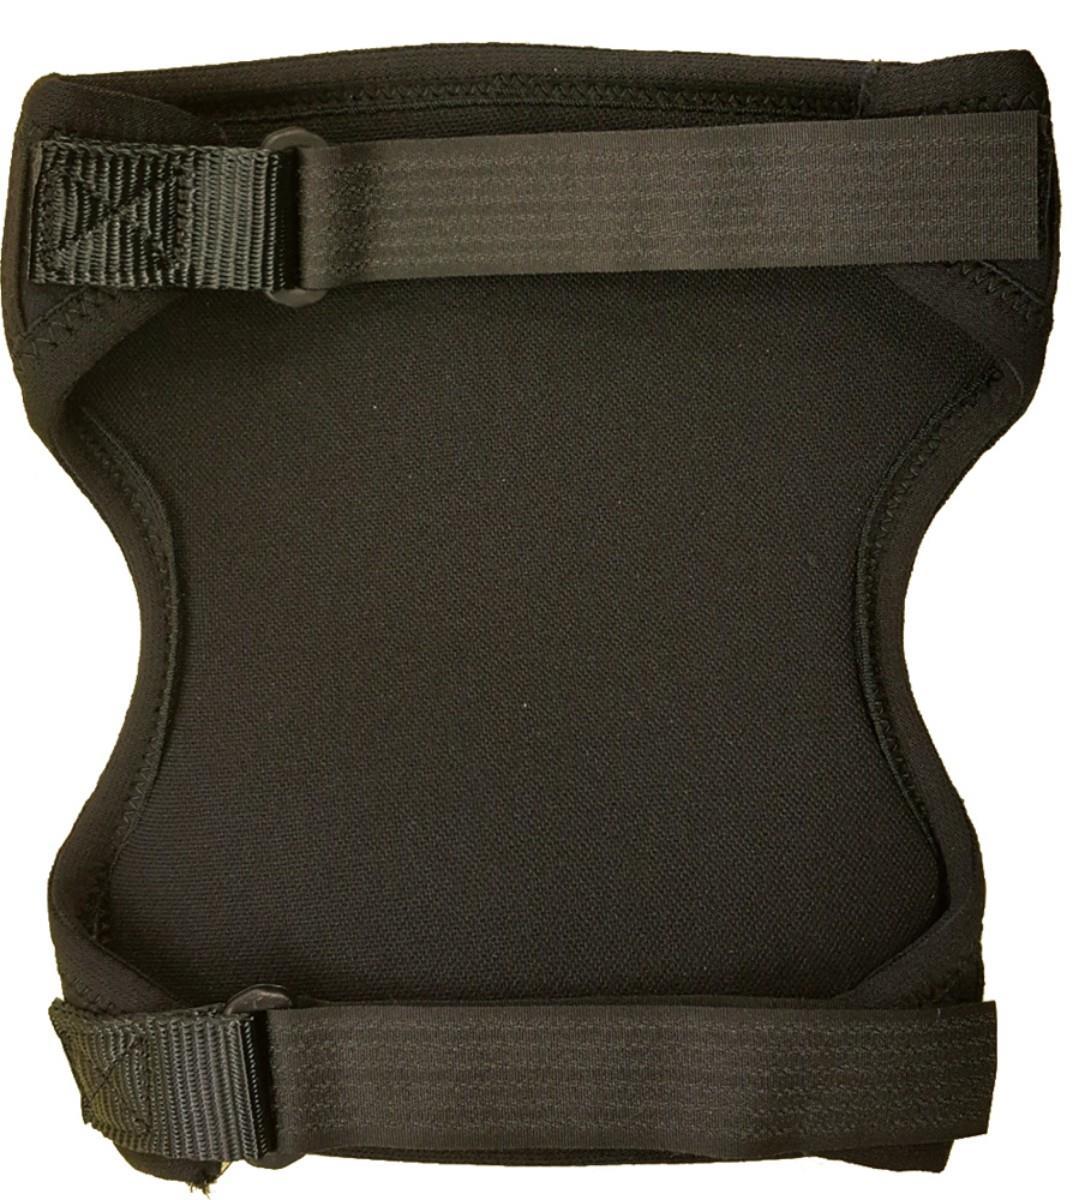 2c1fecbf72 Warmbac Kevlar Knee Pads - Inglesport